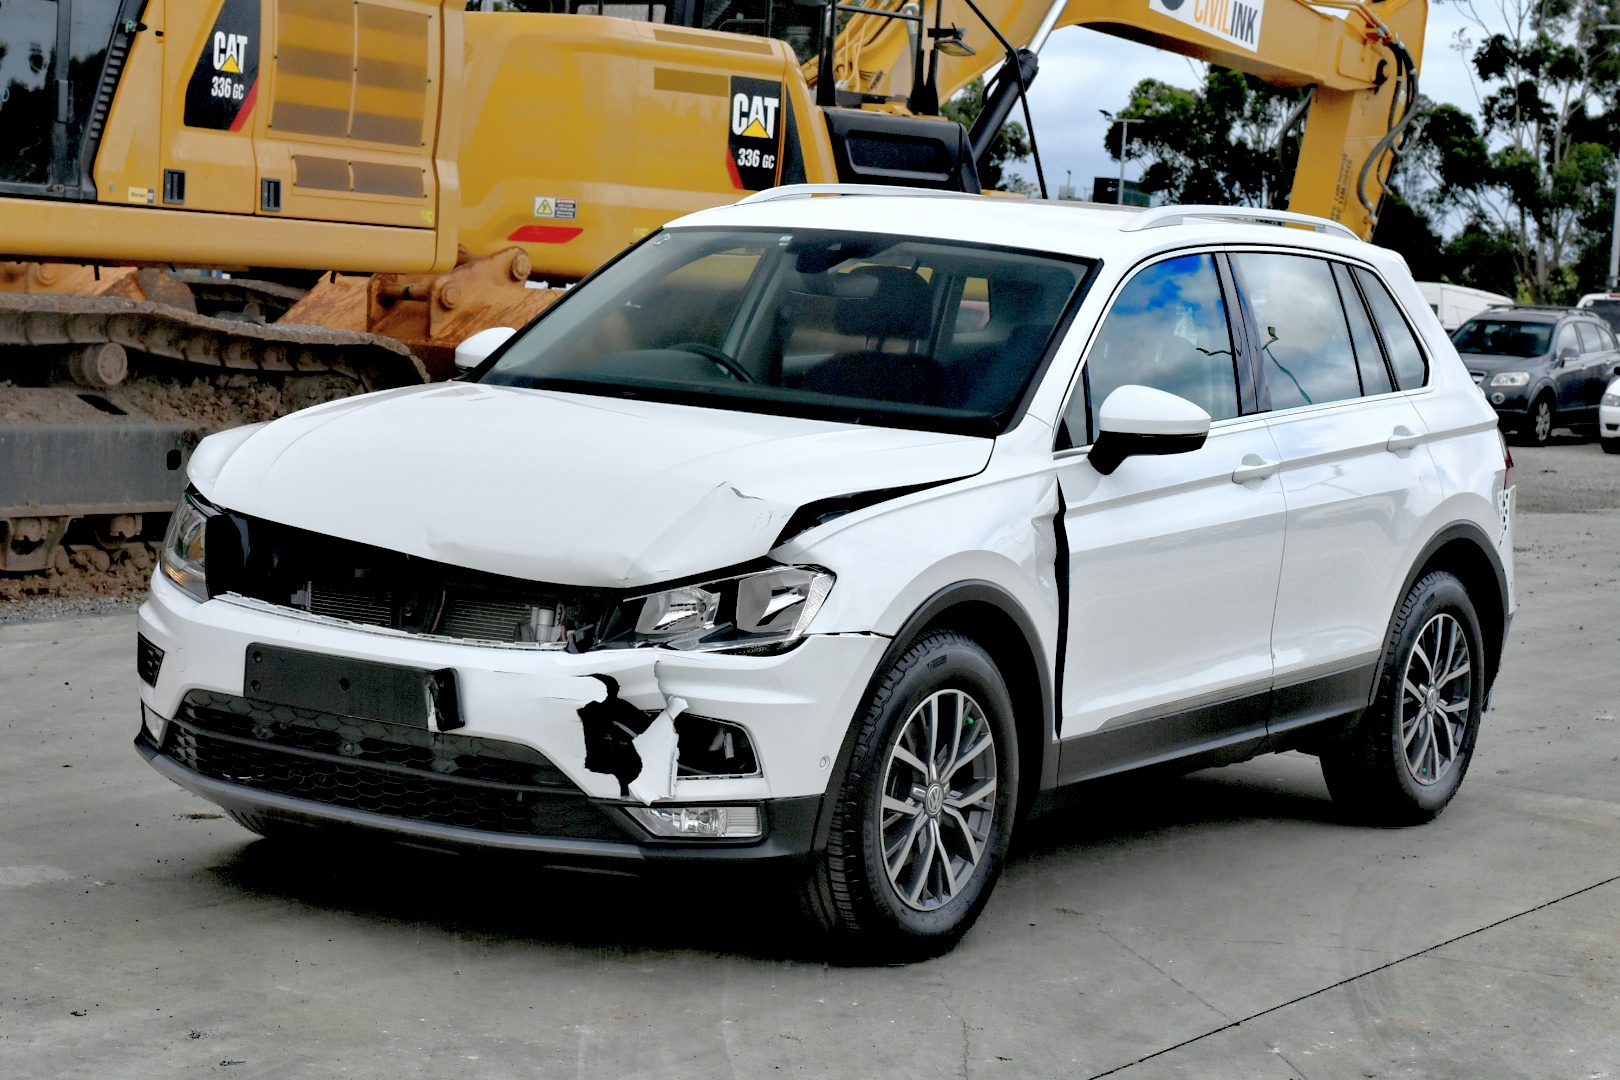 2016 Volkswagen Tiguan 110TSI COMFORTLINE Auto Wagon (WOVR) (DAMAGED)